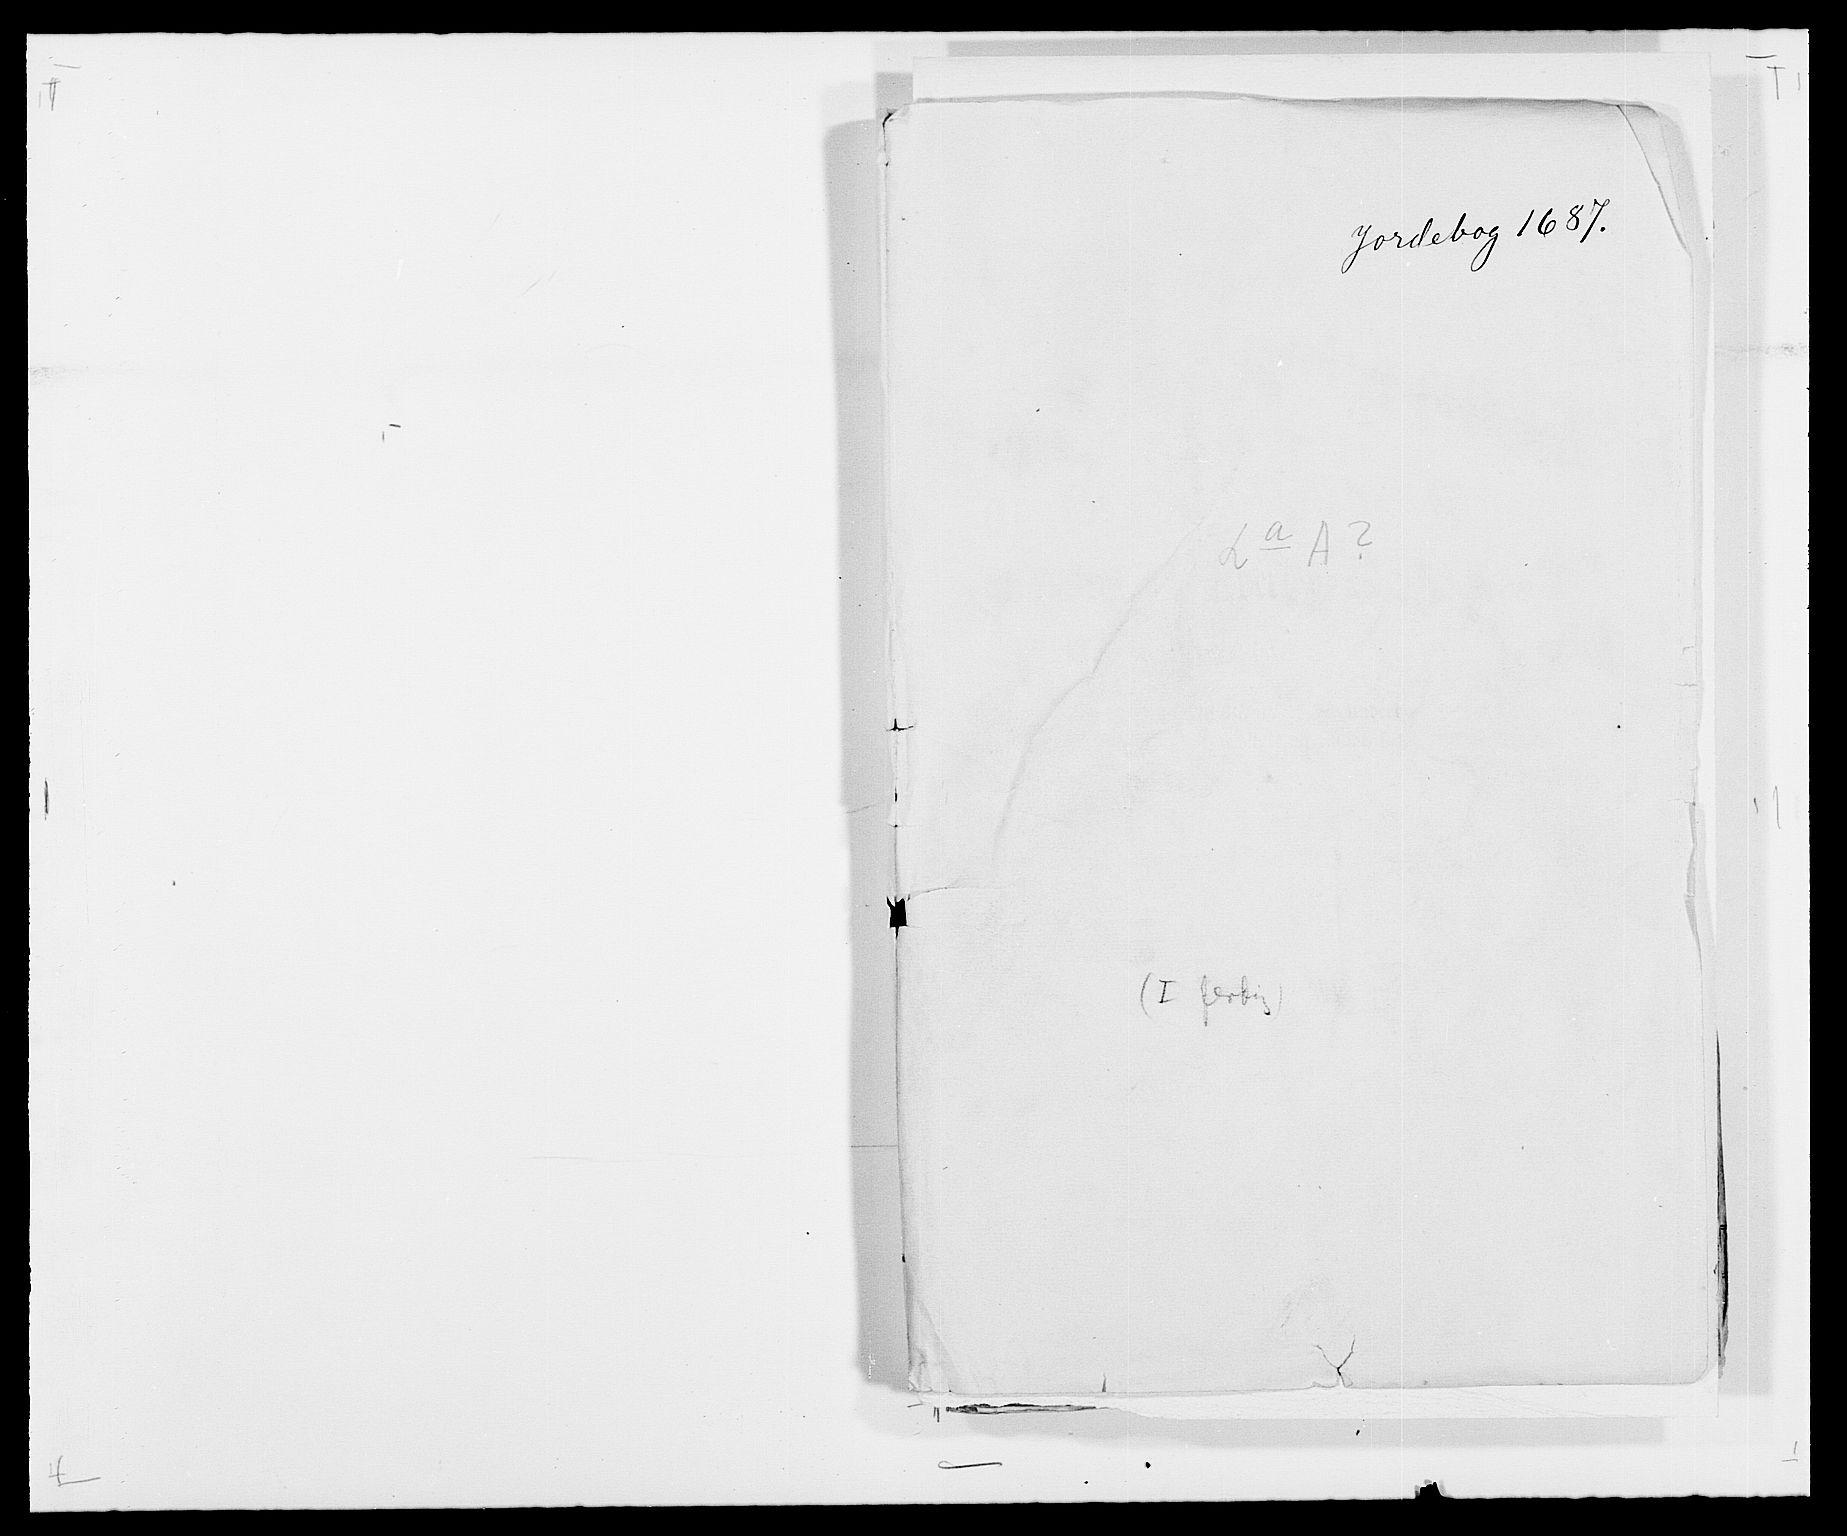 RA, Rentekammeret inntil 1814, Reviderte regnskaper, Fogderegnskap, R63/L4306: Fogderegnskap Inderøy, 1687-1689, s. 14